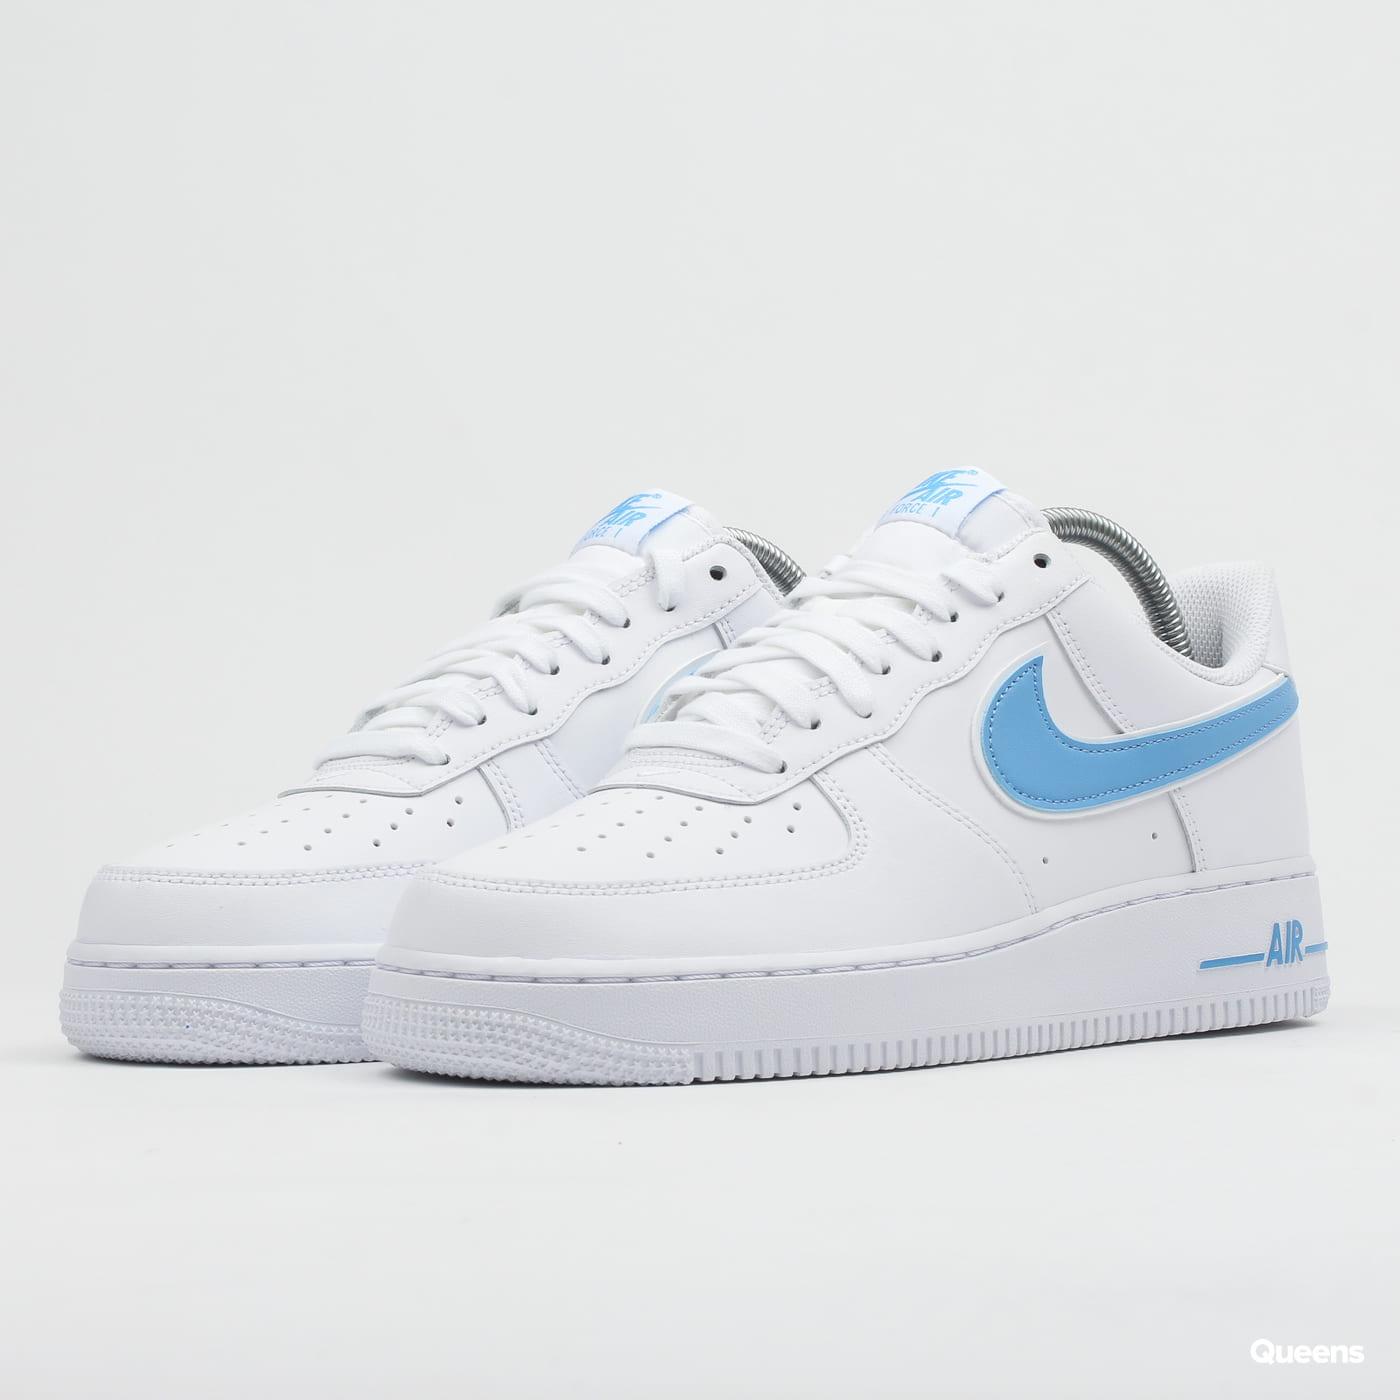 Nike Air Force 1 '07 3 WhiteUniversity Blue AO2423 100